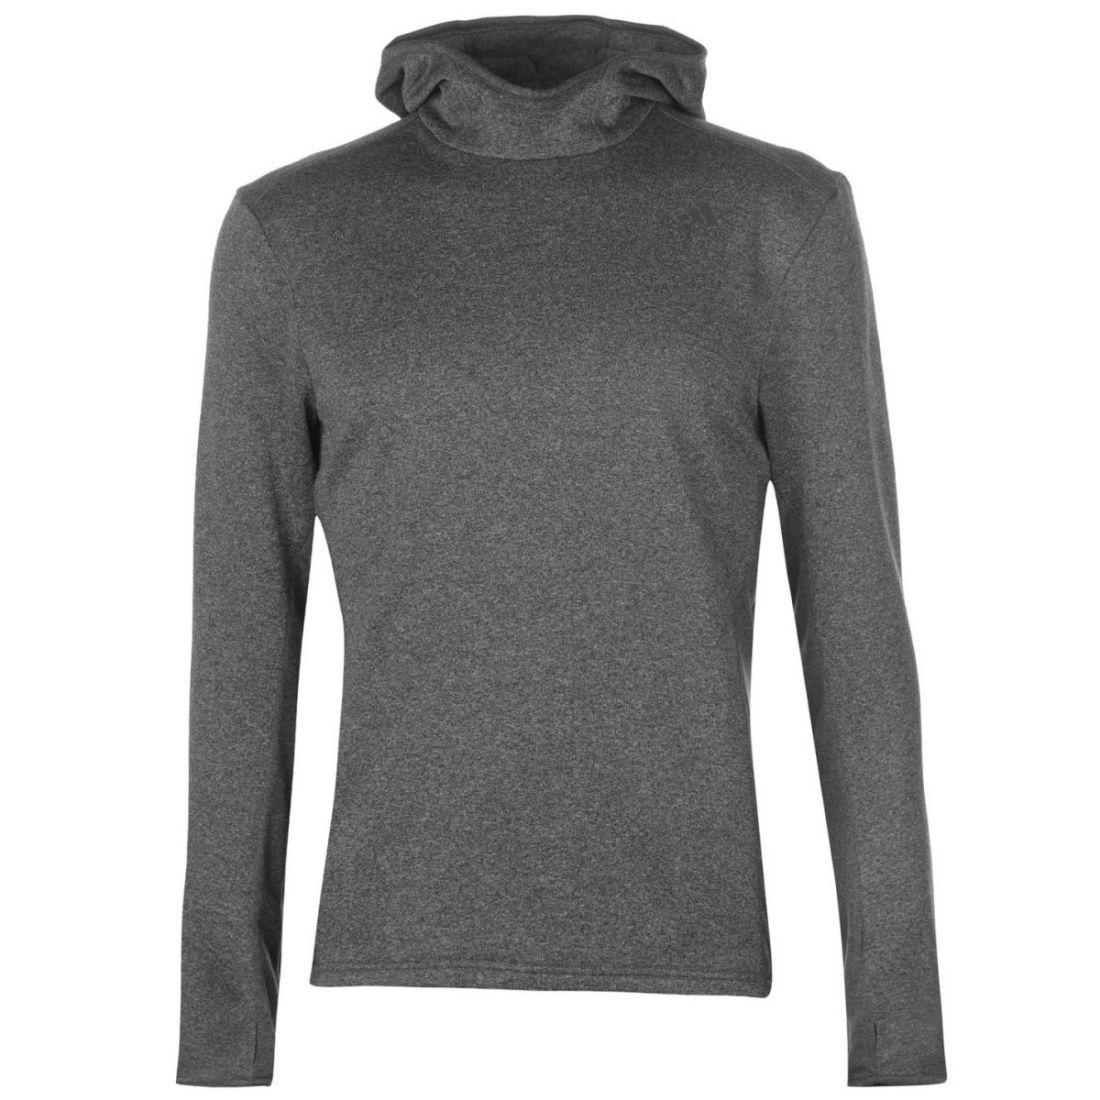 Adidas response Astro hoodie